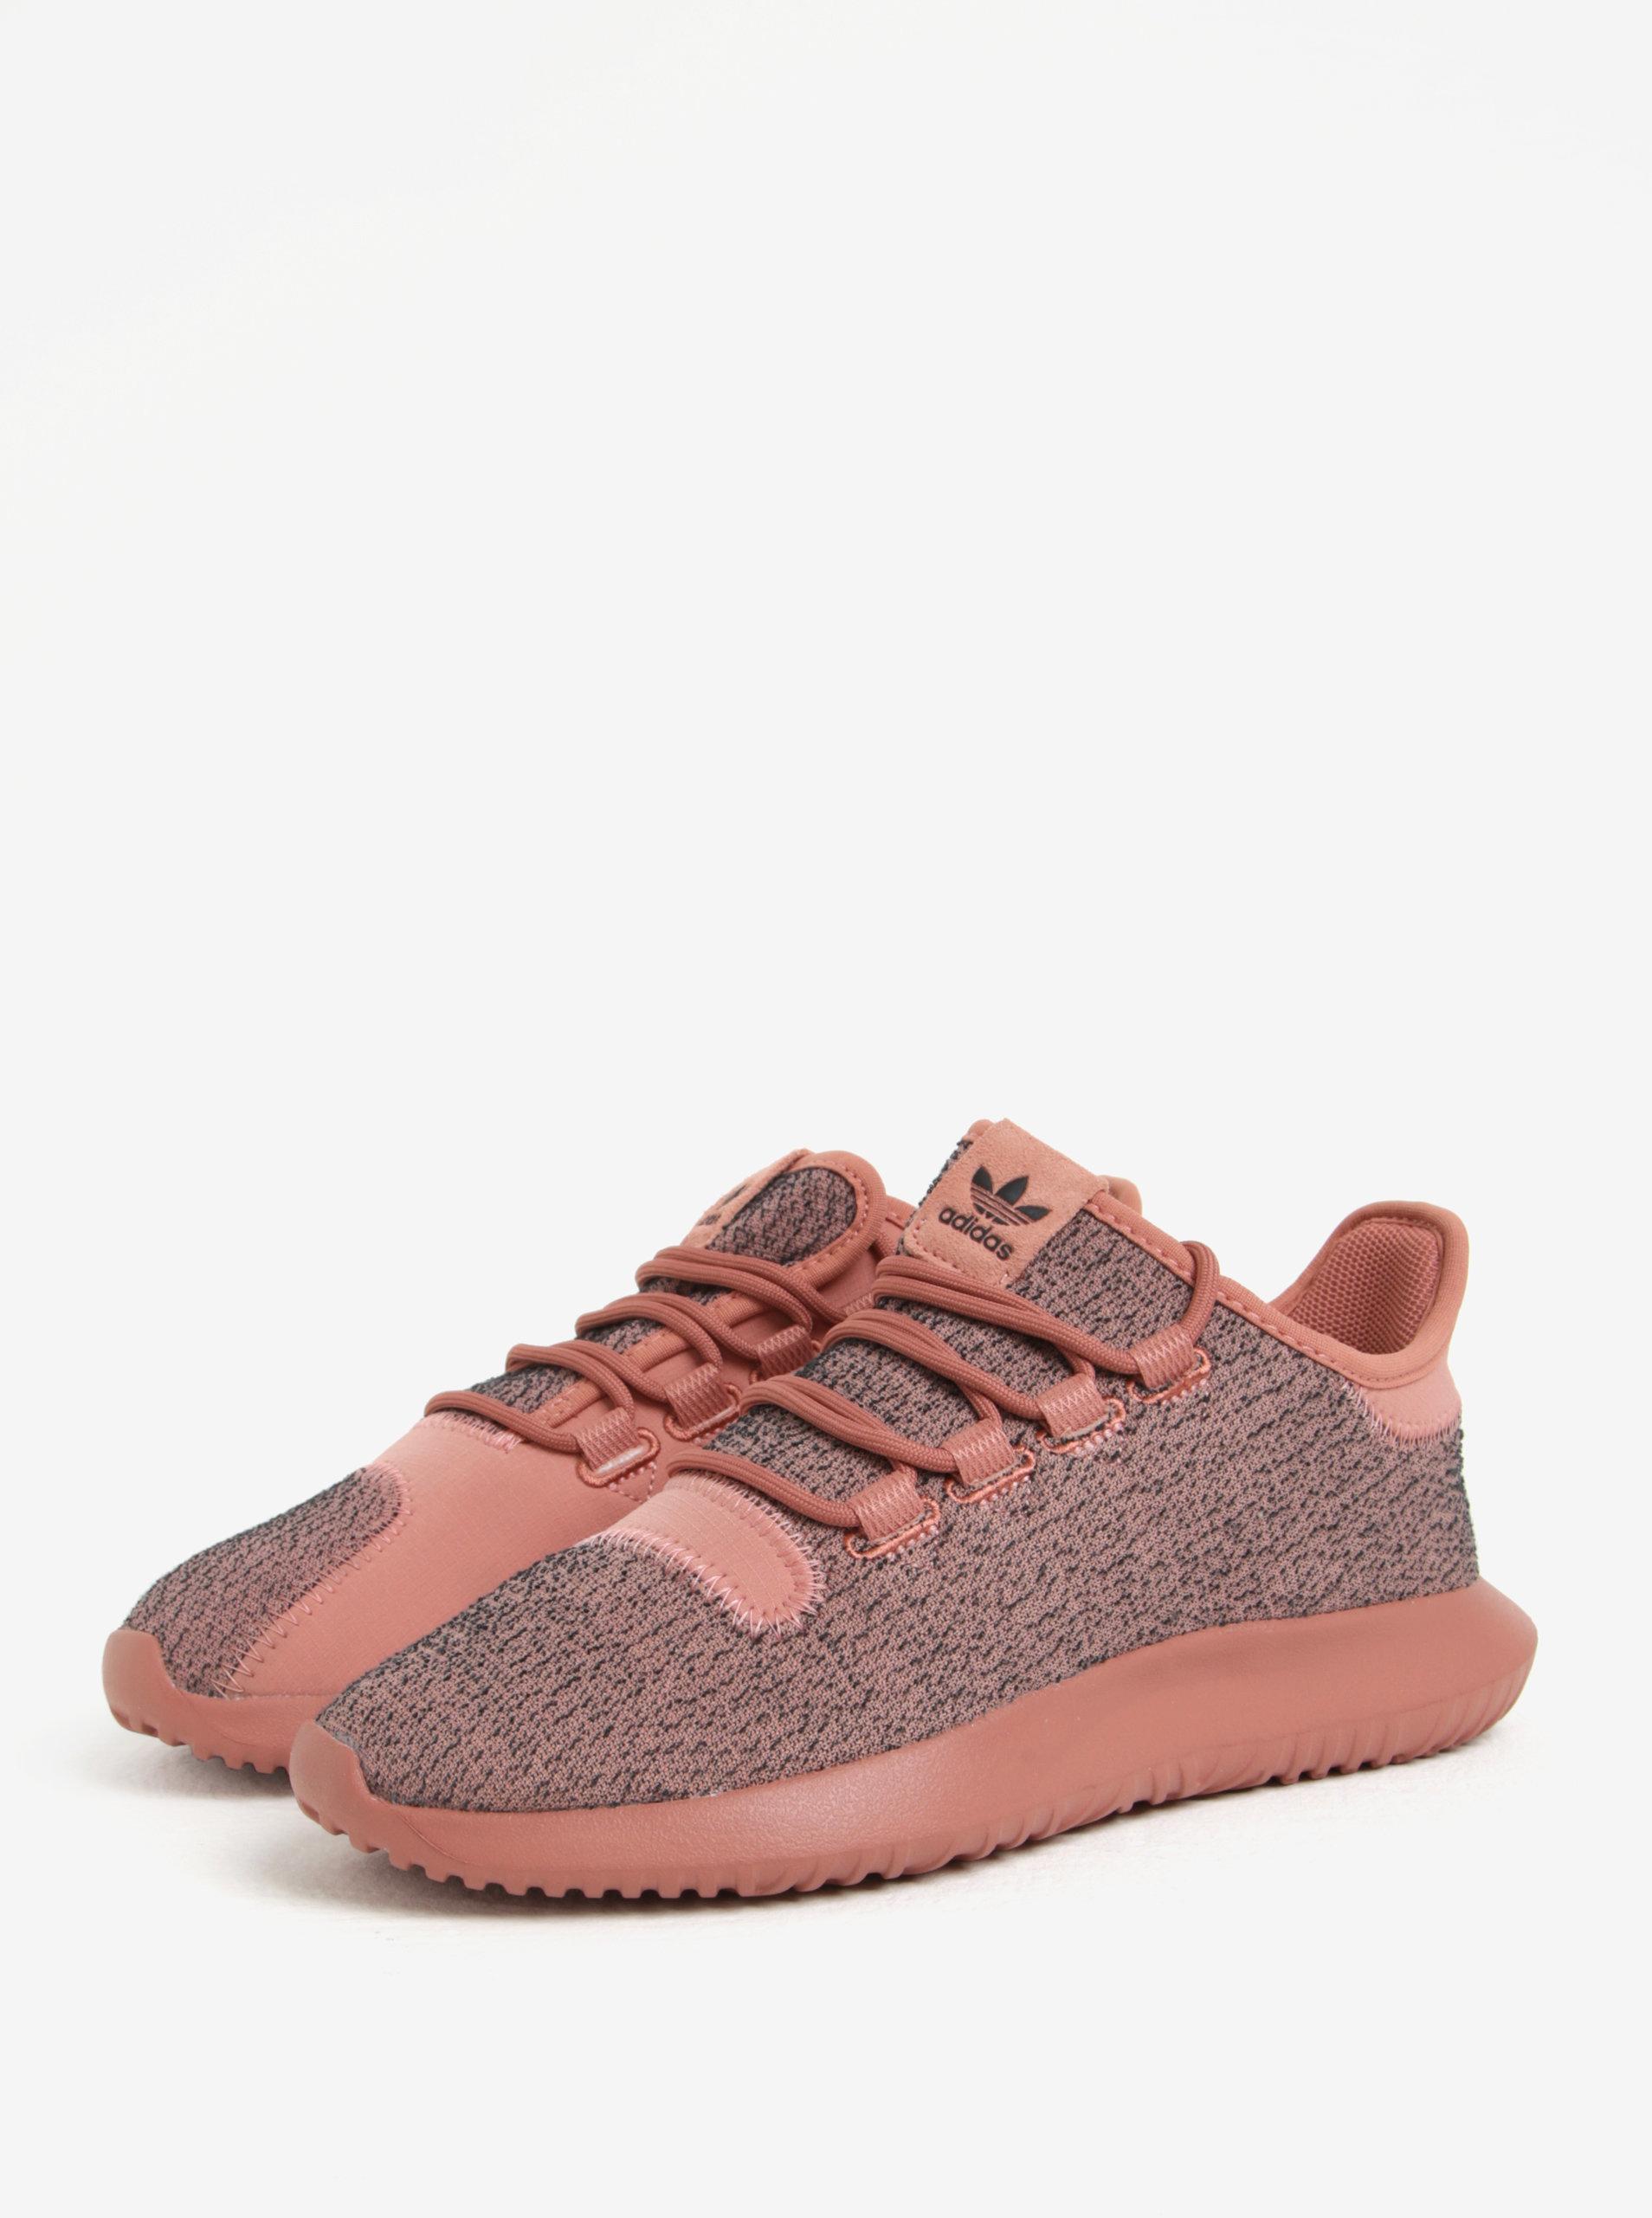 69ce03740c2 Šedo-růžové dámské tenisky adidas Originals Tubular Shadow ...